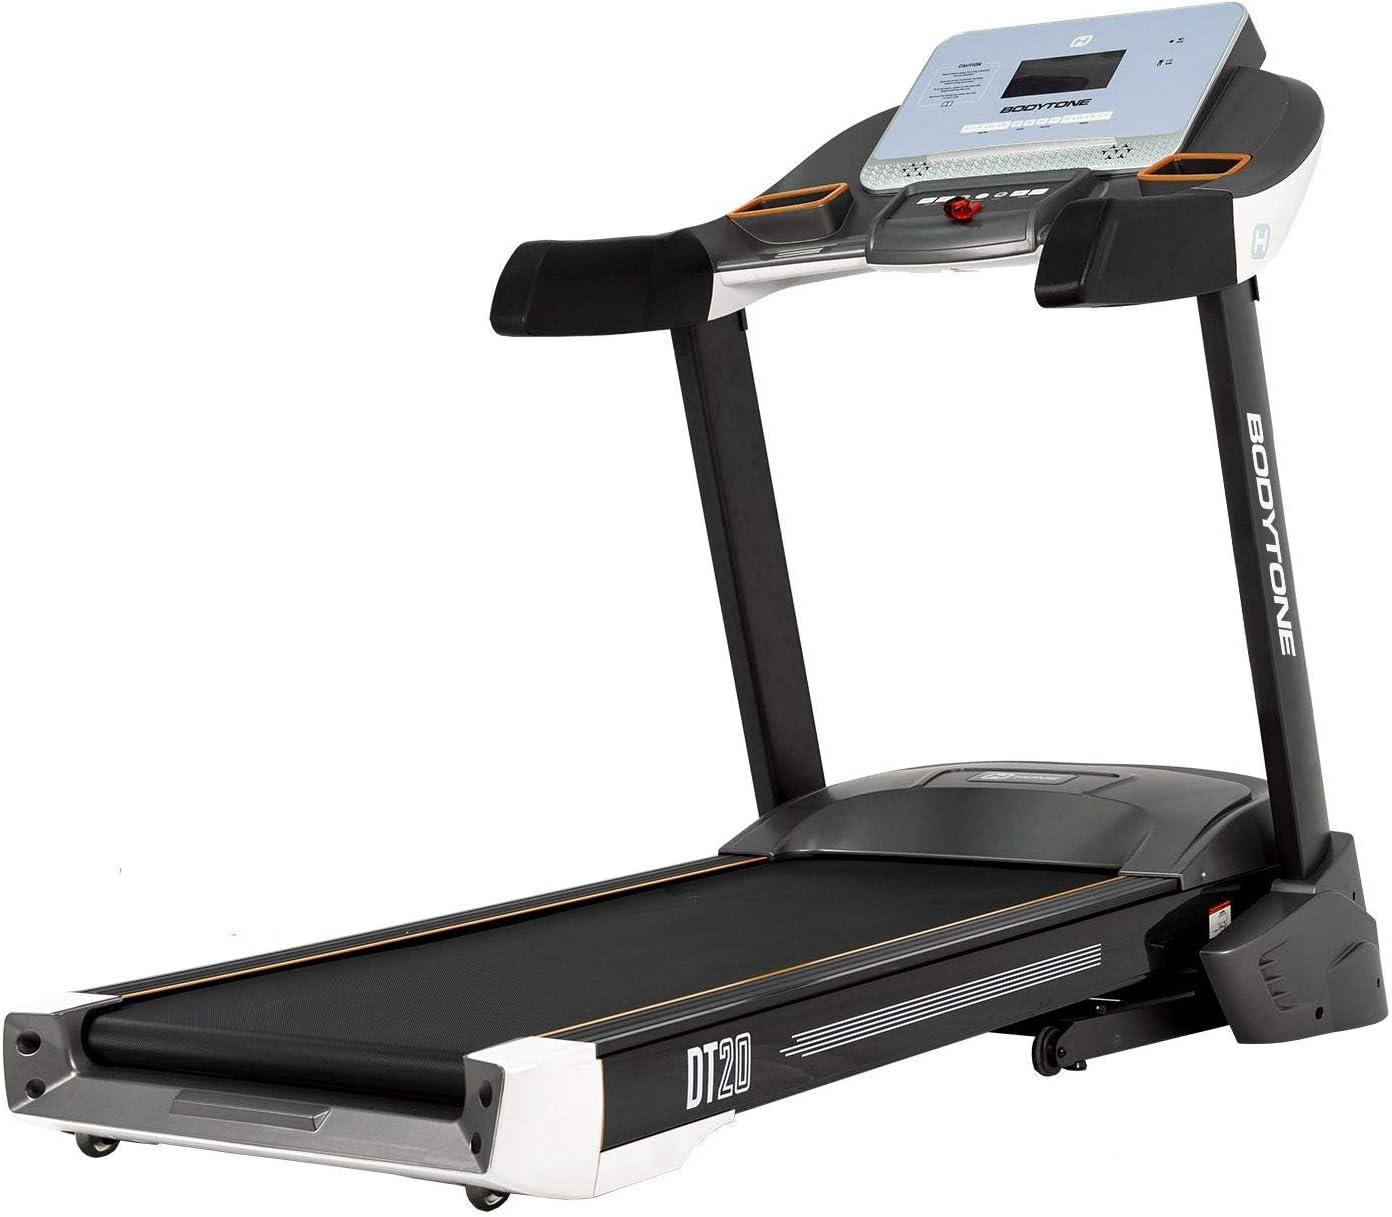 BT BODYTONE - DT20 - Cinta de Correr XXL Plegable para Fitness con ...